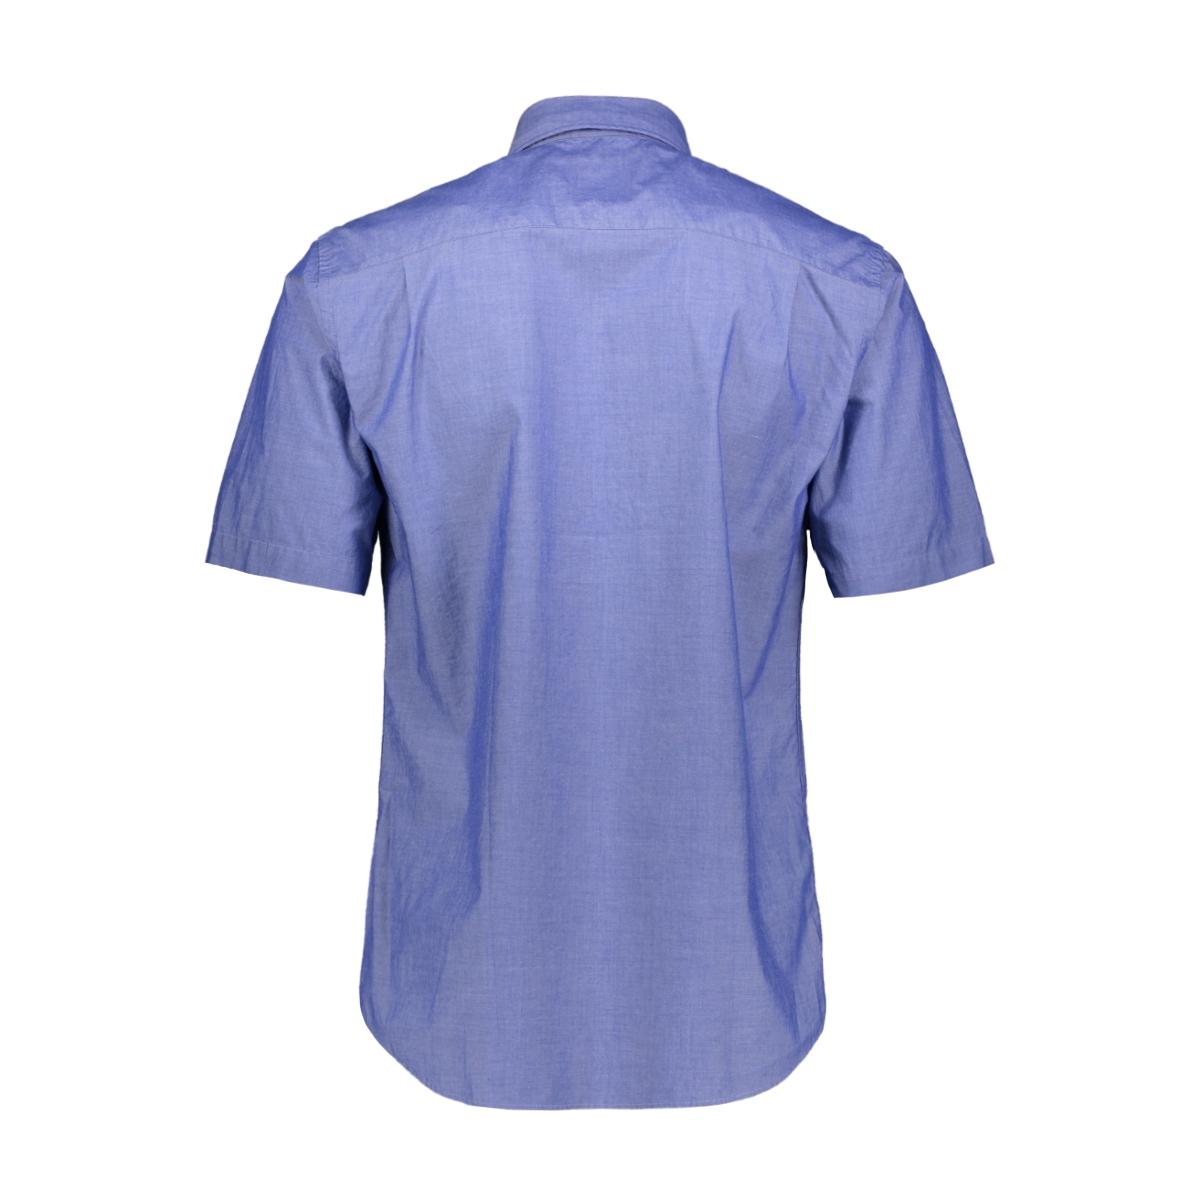 casual overhemd km 052906 campbell overhemd 381 donkerblauw uni